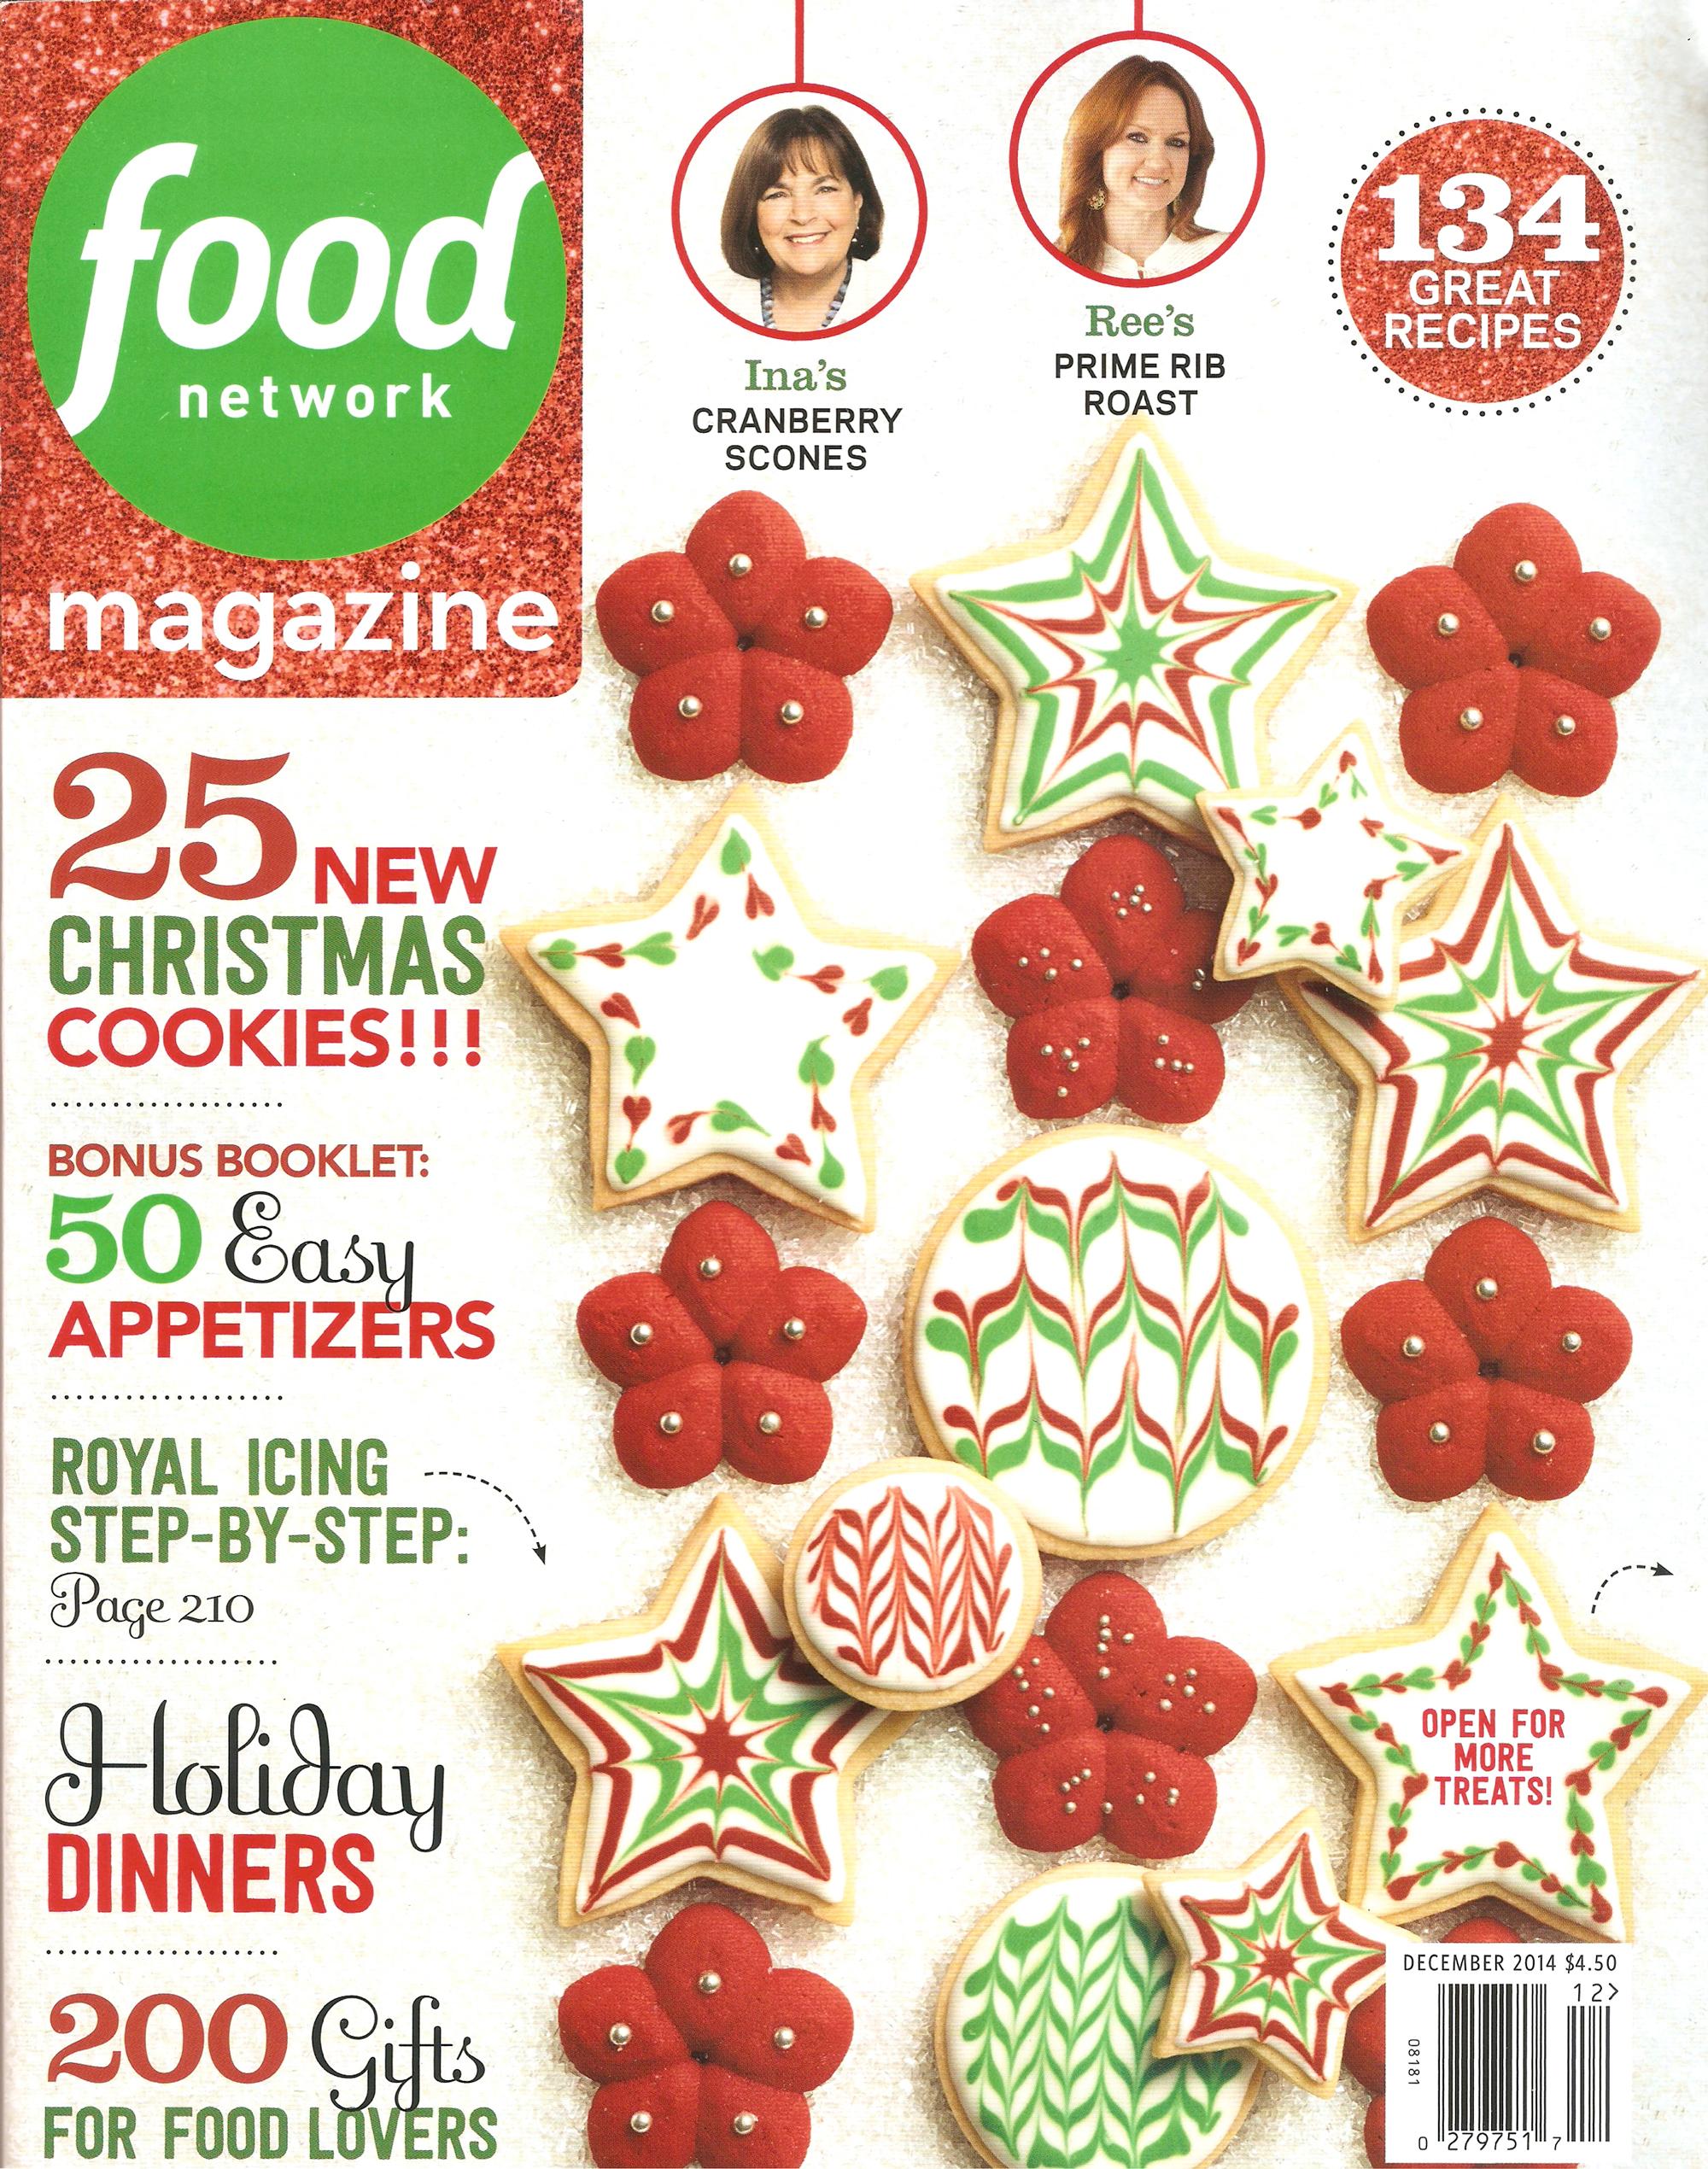 FOOD NETWORK MAGAZINE - December 2014